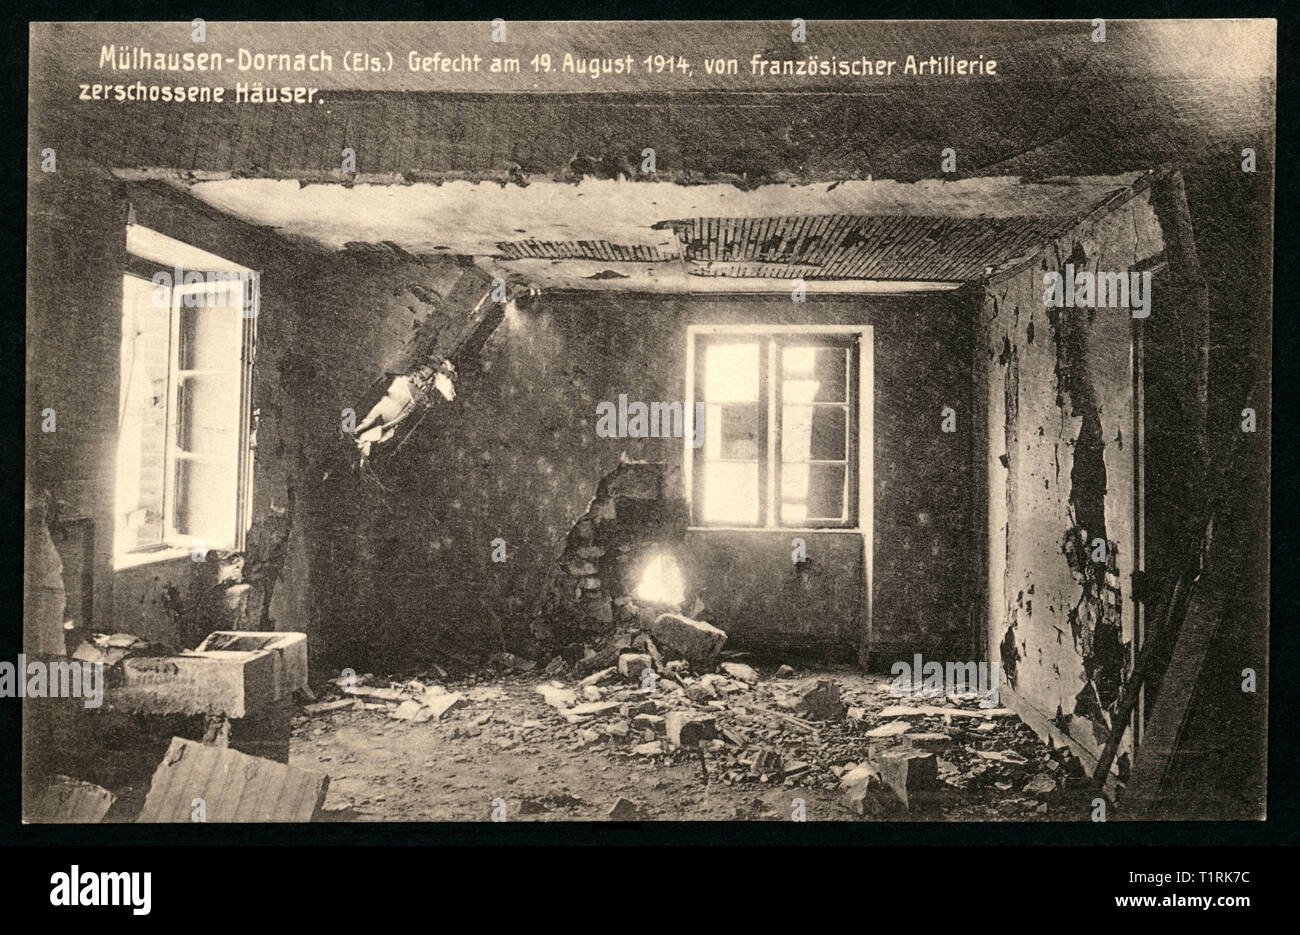 France, Alsace, Mulhouse, WW I, propaganda, patriotic postcard with the title: 'Mülhausen-Dornach (Els.), Gefecht am 19. August 1914, von französischer Artillerie zerschossenen Häuser '  (Mulhouse-Dornach, Alsace, battle on 19. August 1914, demolished houses by French artillery, published by Schaar and Dathe, 1895-1934, Trier. , Additional-Rights-Clearance-Info-Not-Available - Stock Image